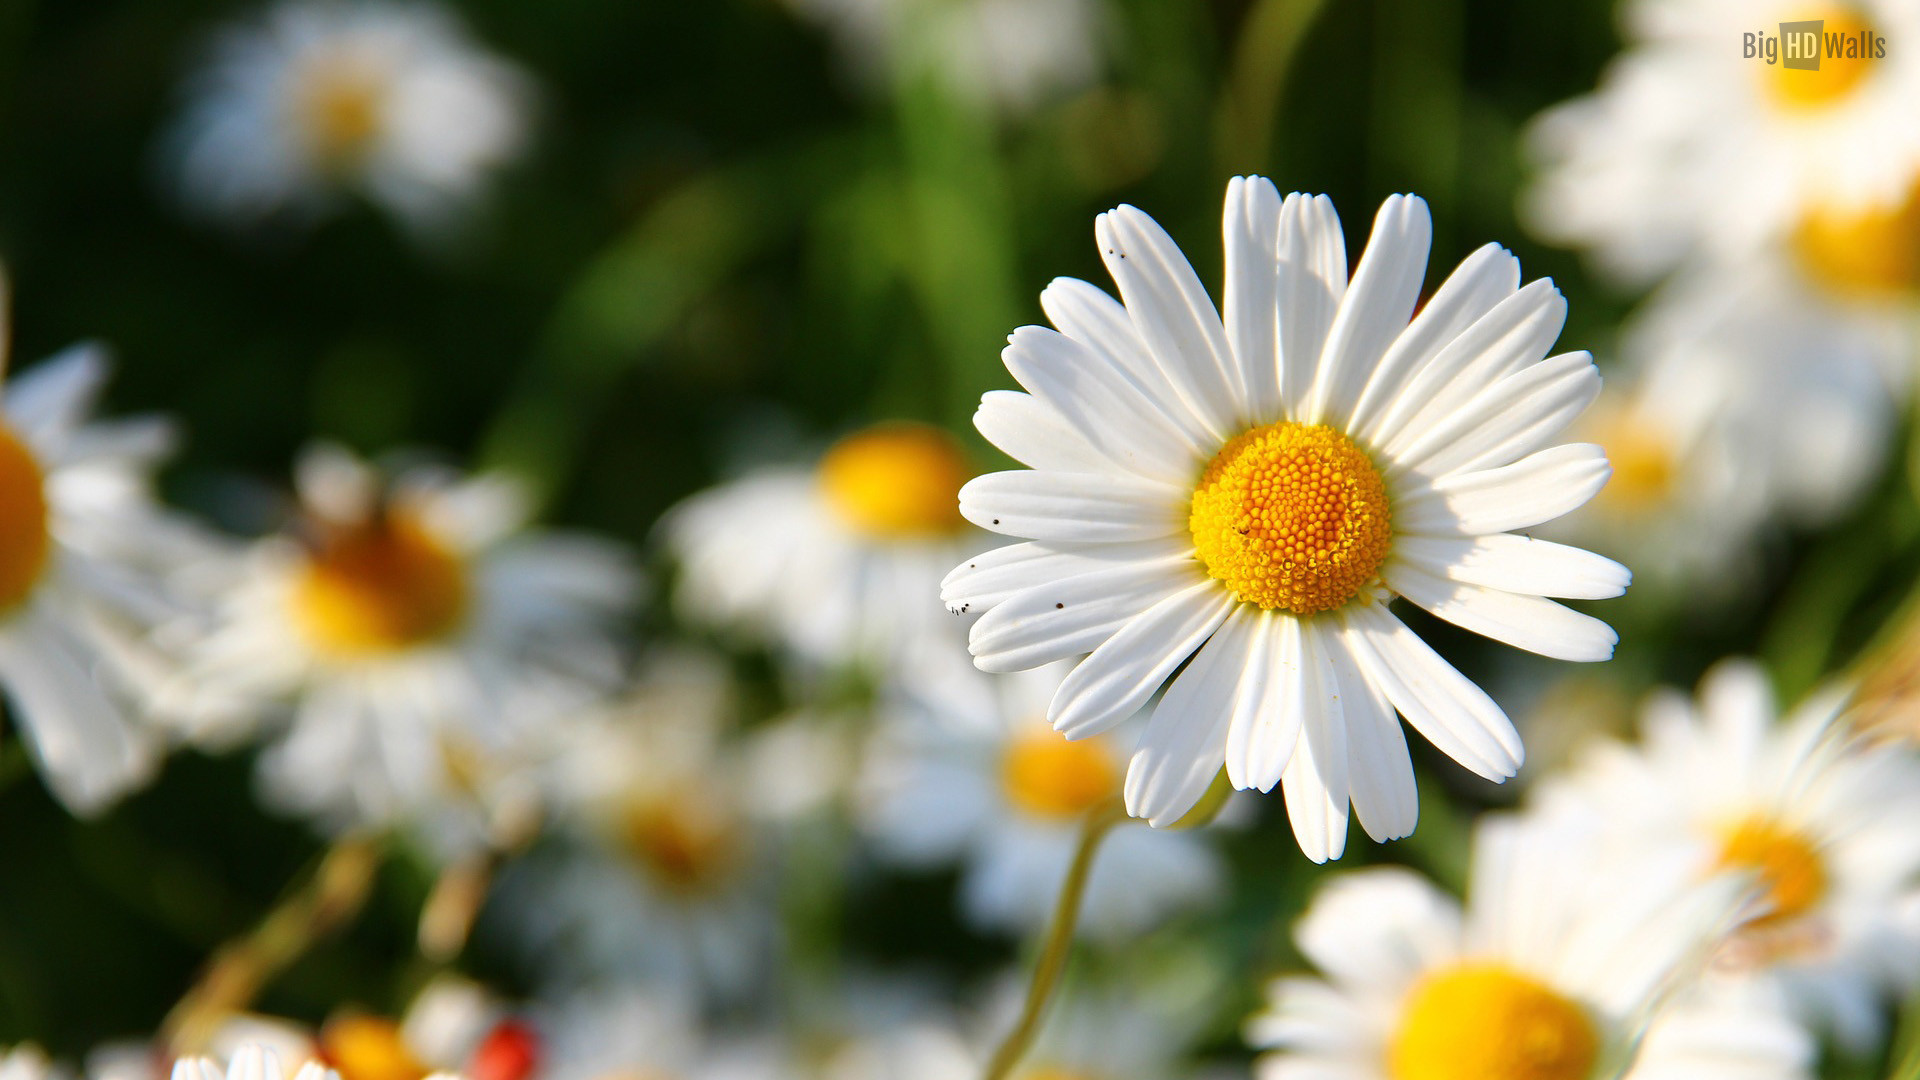 Daisy flower wallpaper 57 images 1920x1080 daisy flower hd desktop backround izmirmasajfo Choice Image